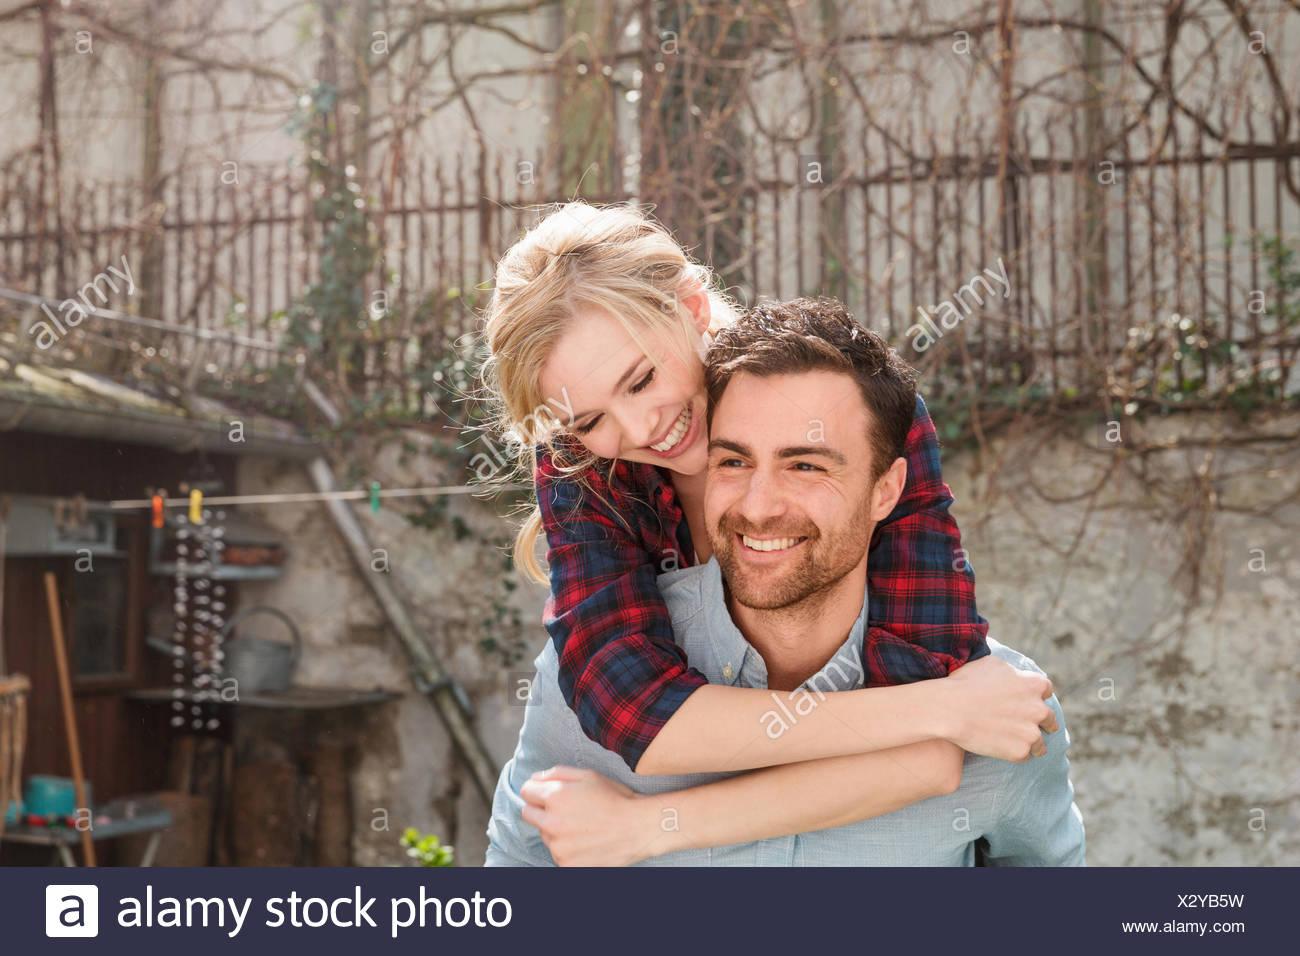 Man giving woman piggyback smiling Photo Stock